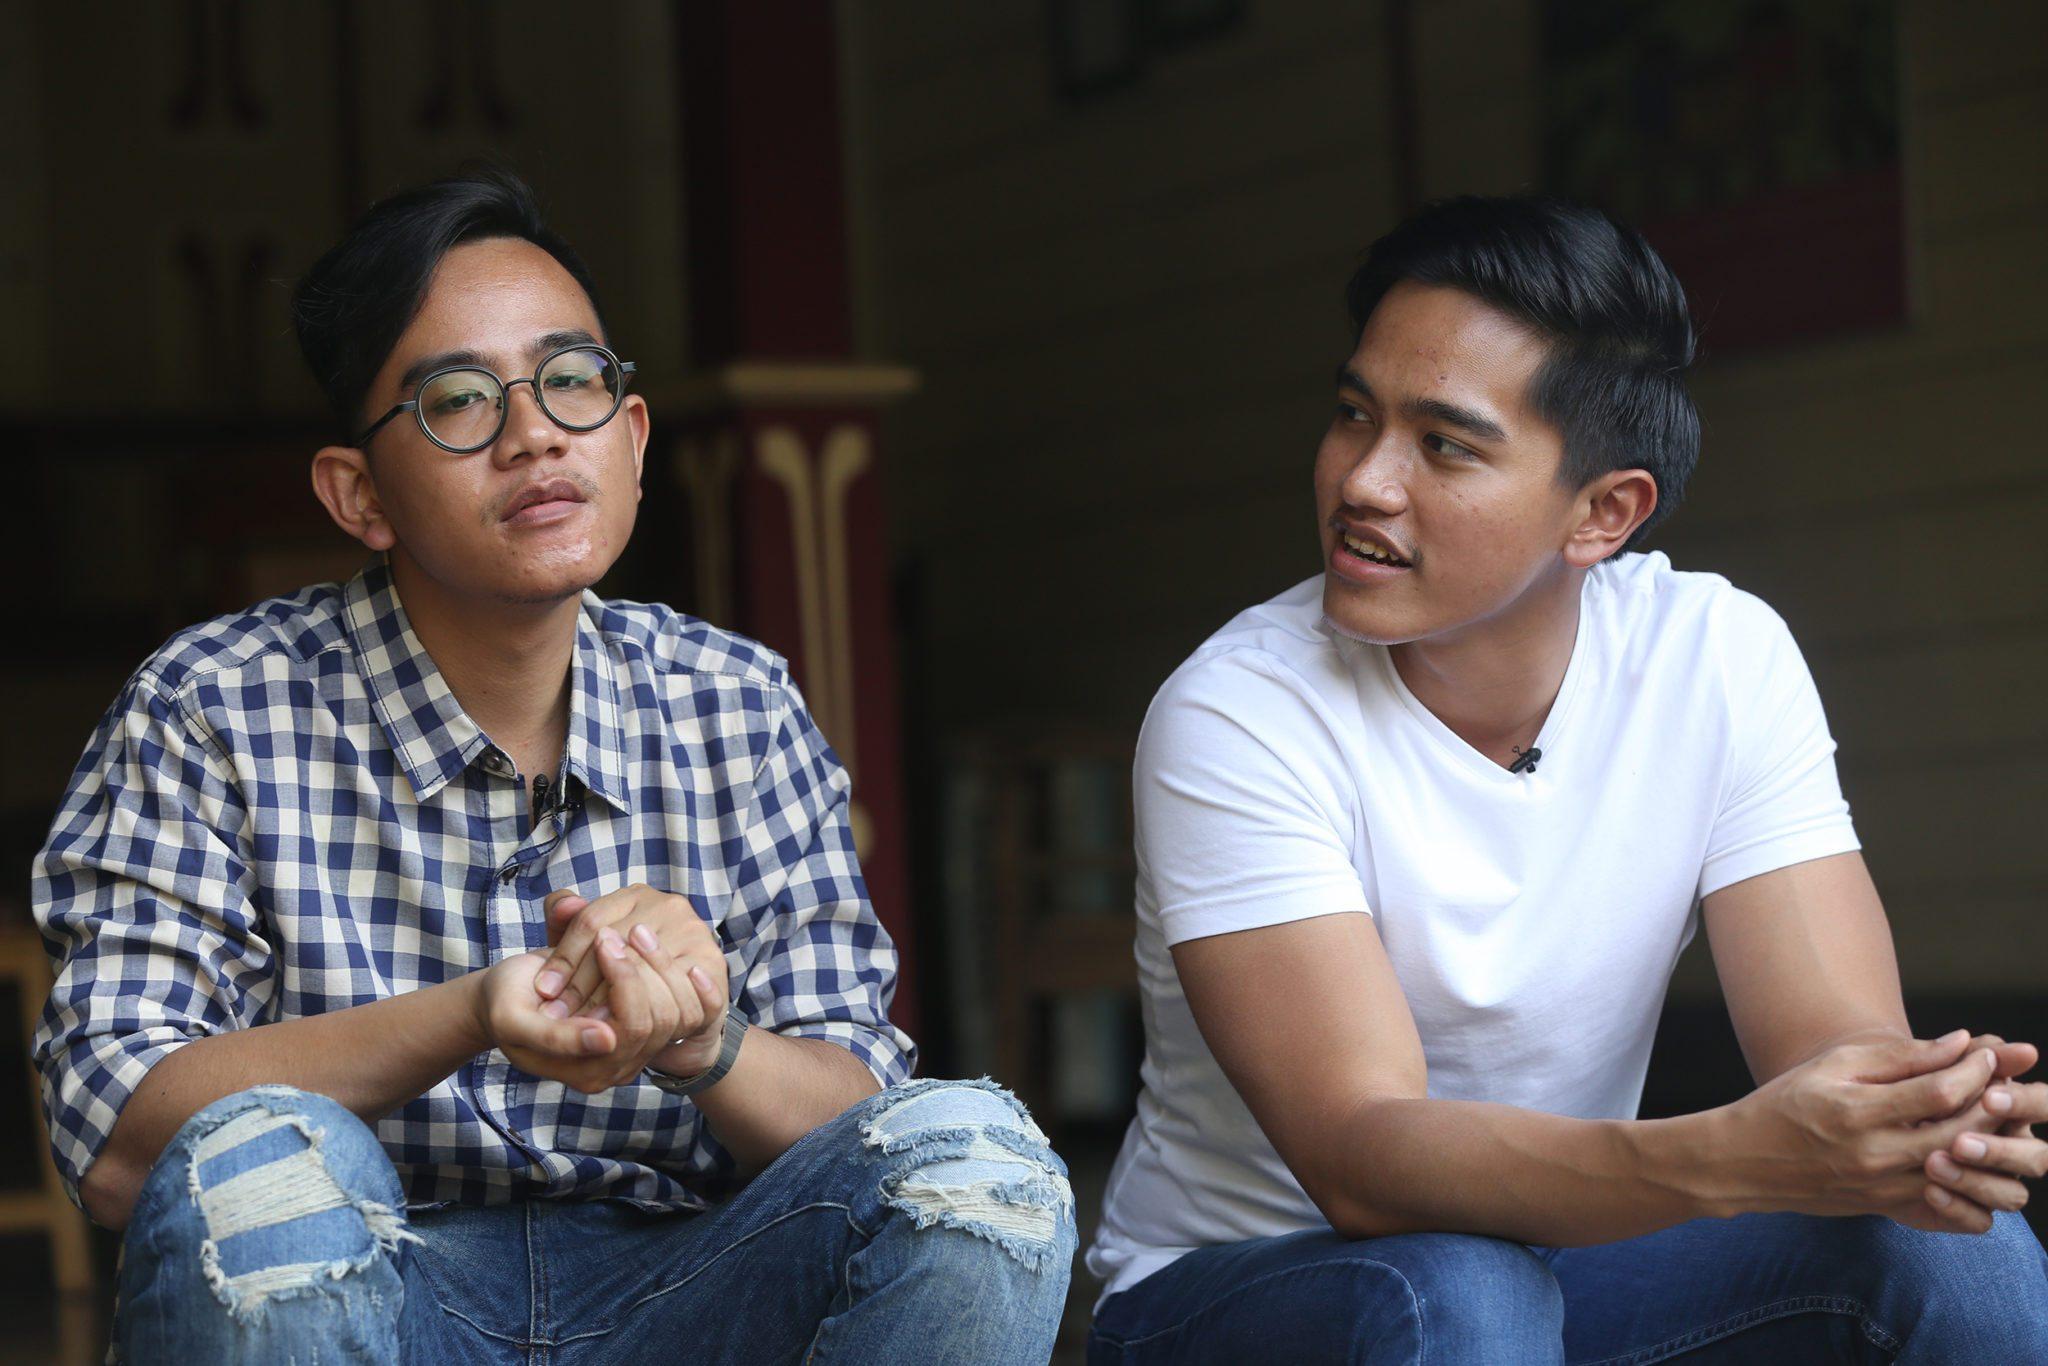 Kamu Tau Gak? Ini Dia 3 Usaha Kuliner Milik Anak Jokowi!